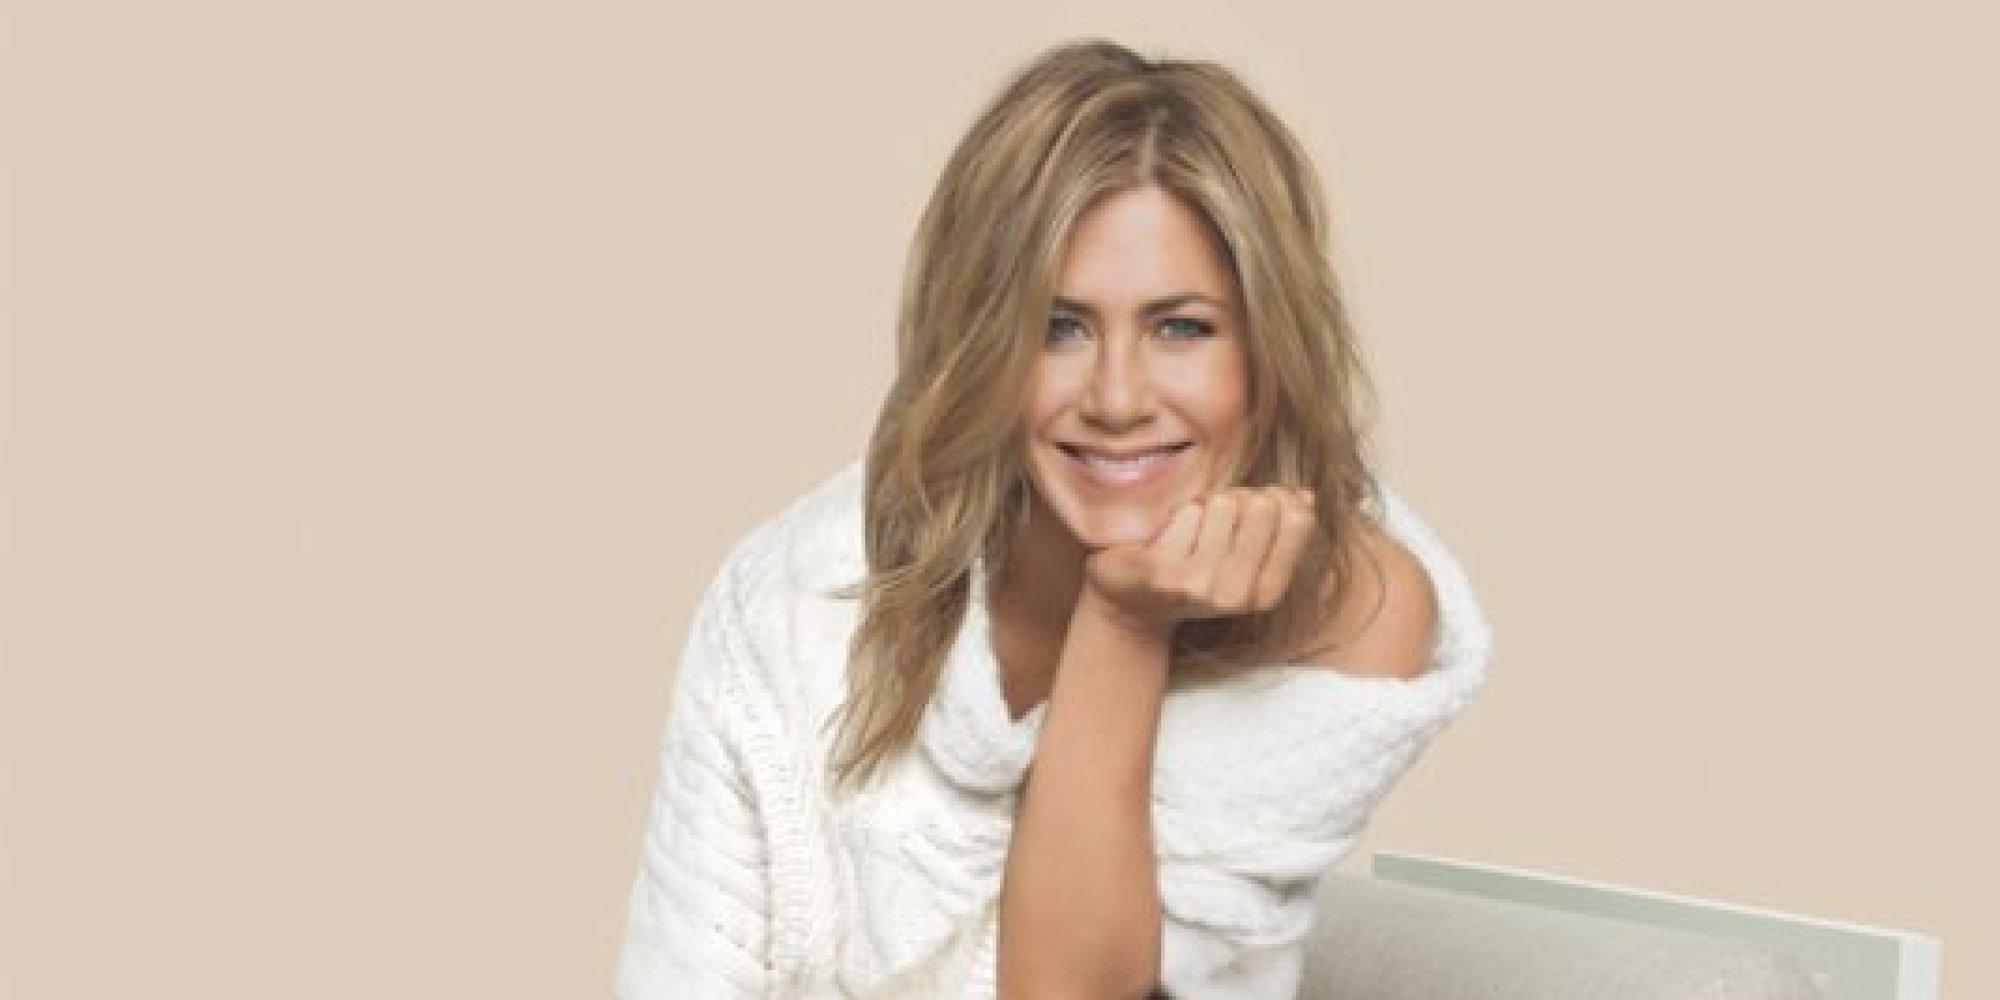 Jennifer Aniston S Beauty Secrets Her Top Tips For